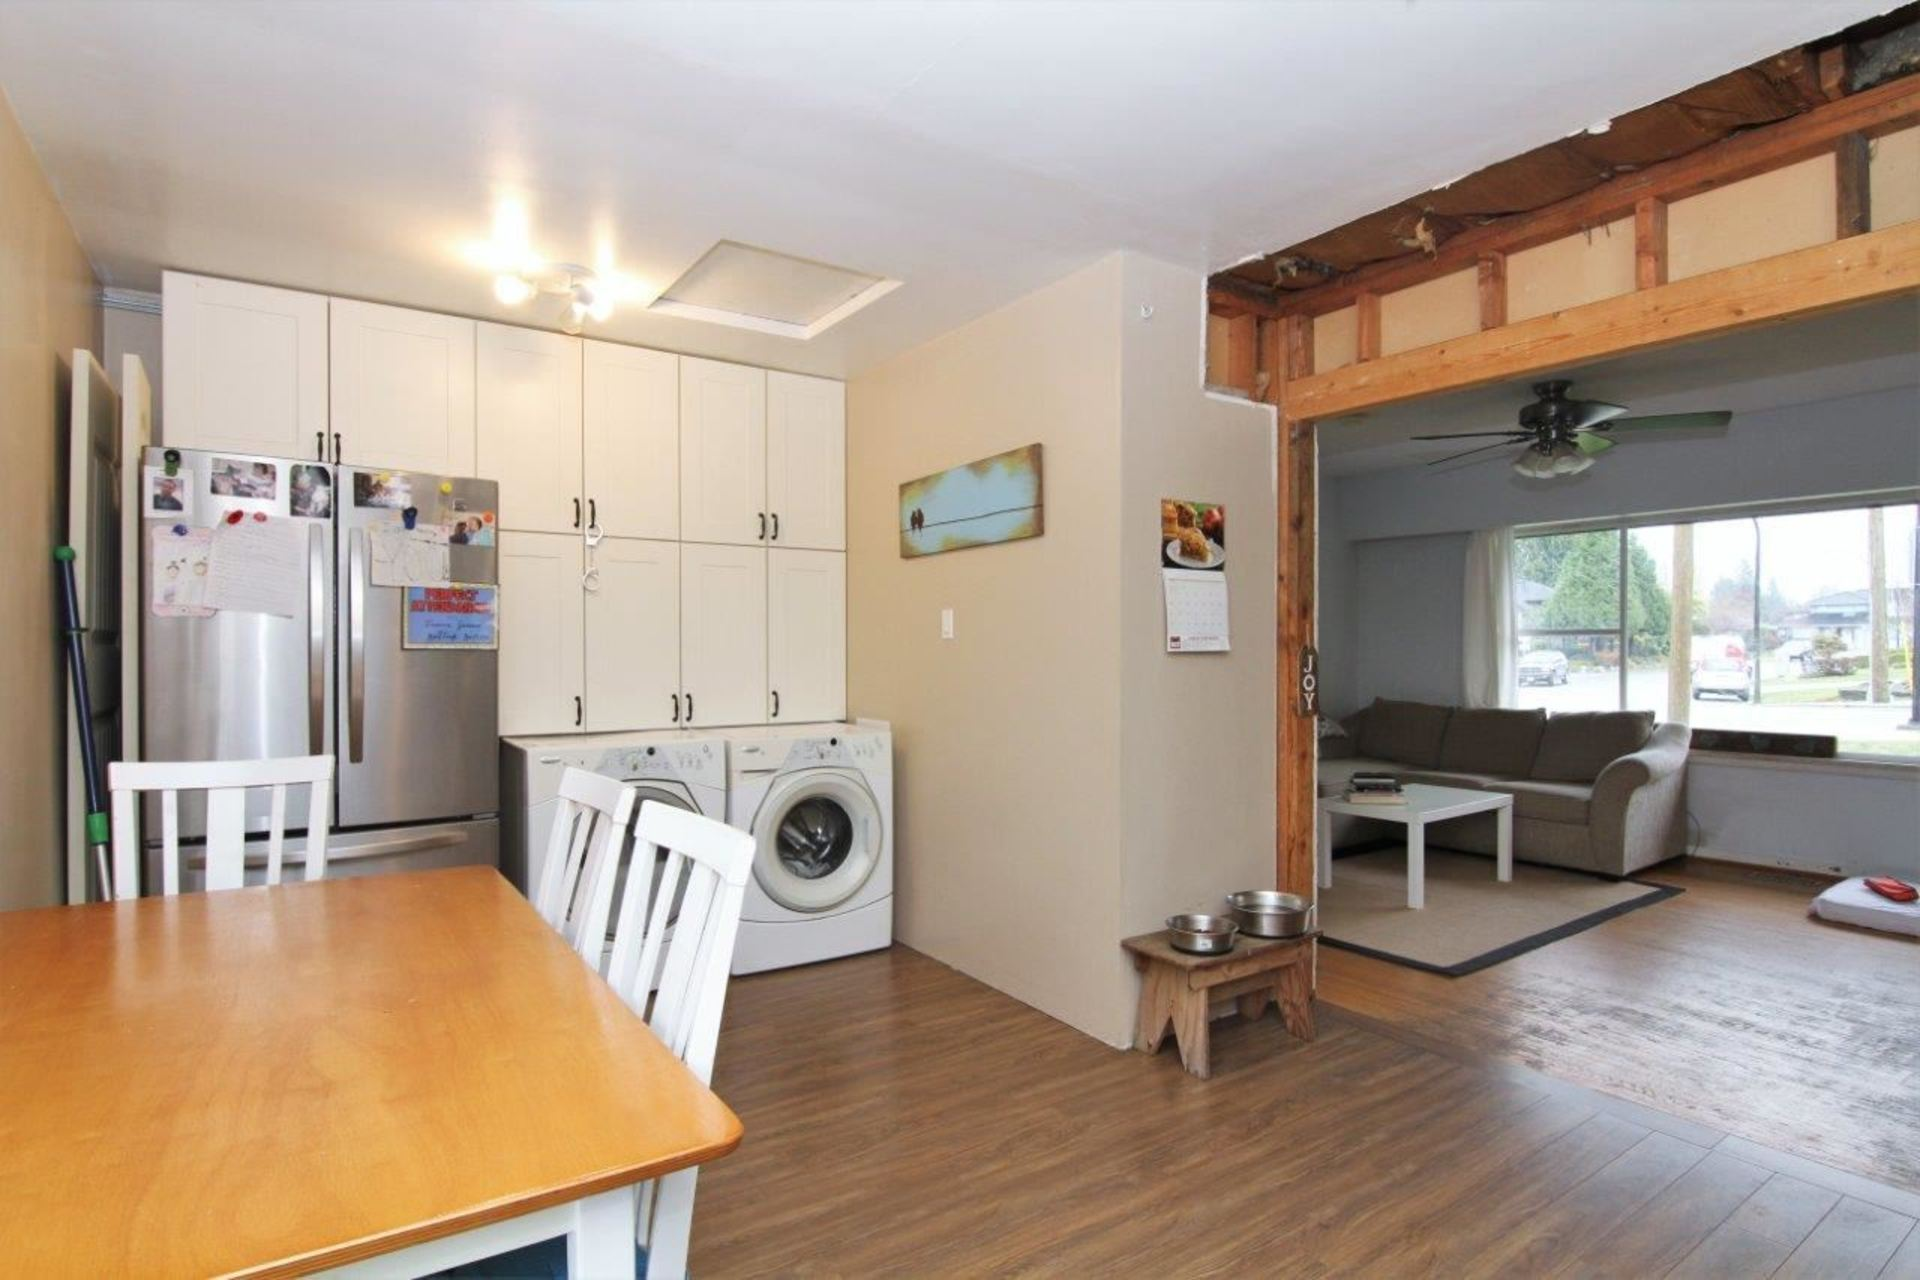 12351-203-street-west-central-maple-ridge-05 at 12351 203 Street, West Central, Maple Ridge